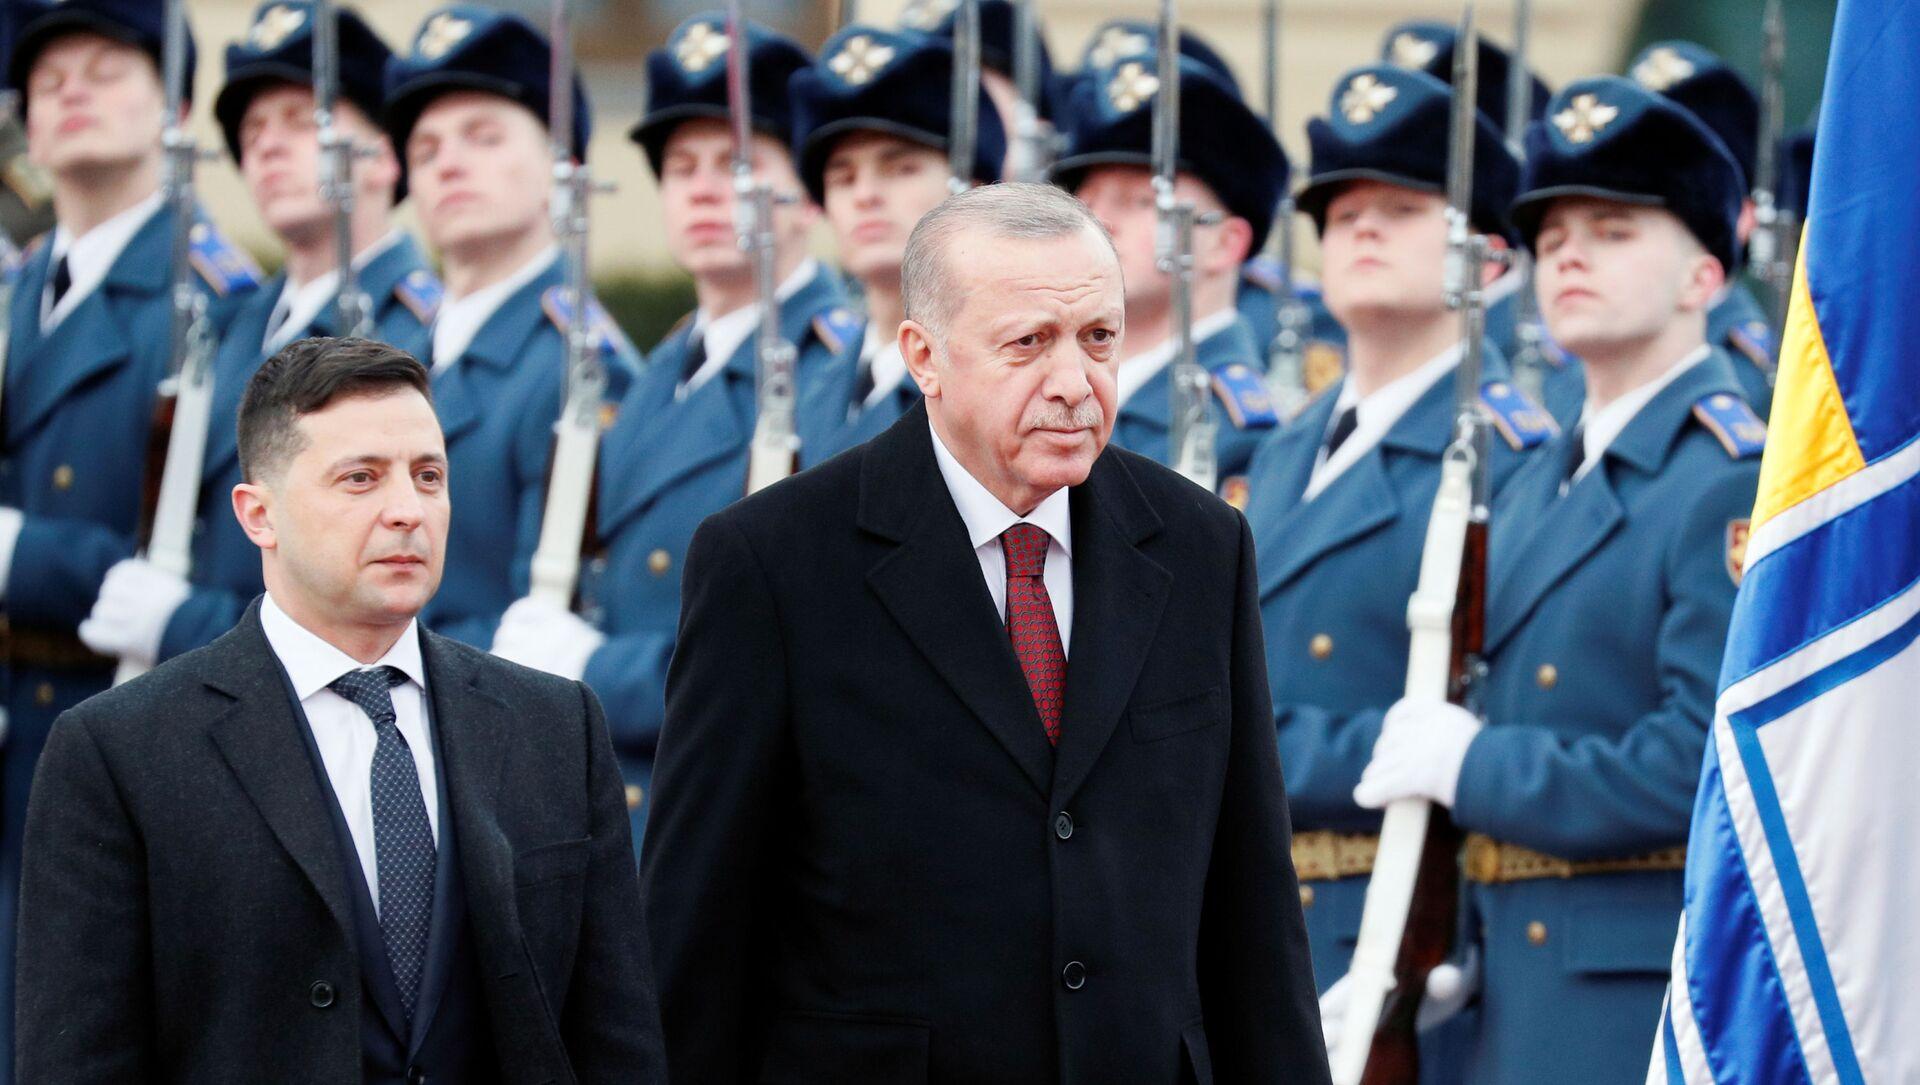 El presidente de Ucrania, Volodímir Zelenski, junto a su homólogo turco, Recep Tayyip Erdogan - Sputnik Mundo, 1920, 03.02.2020